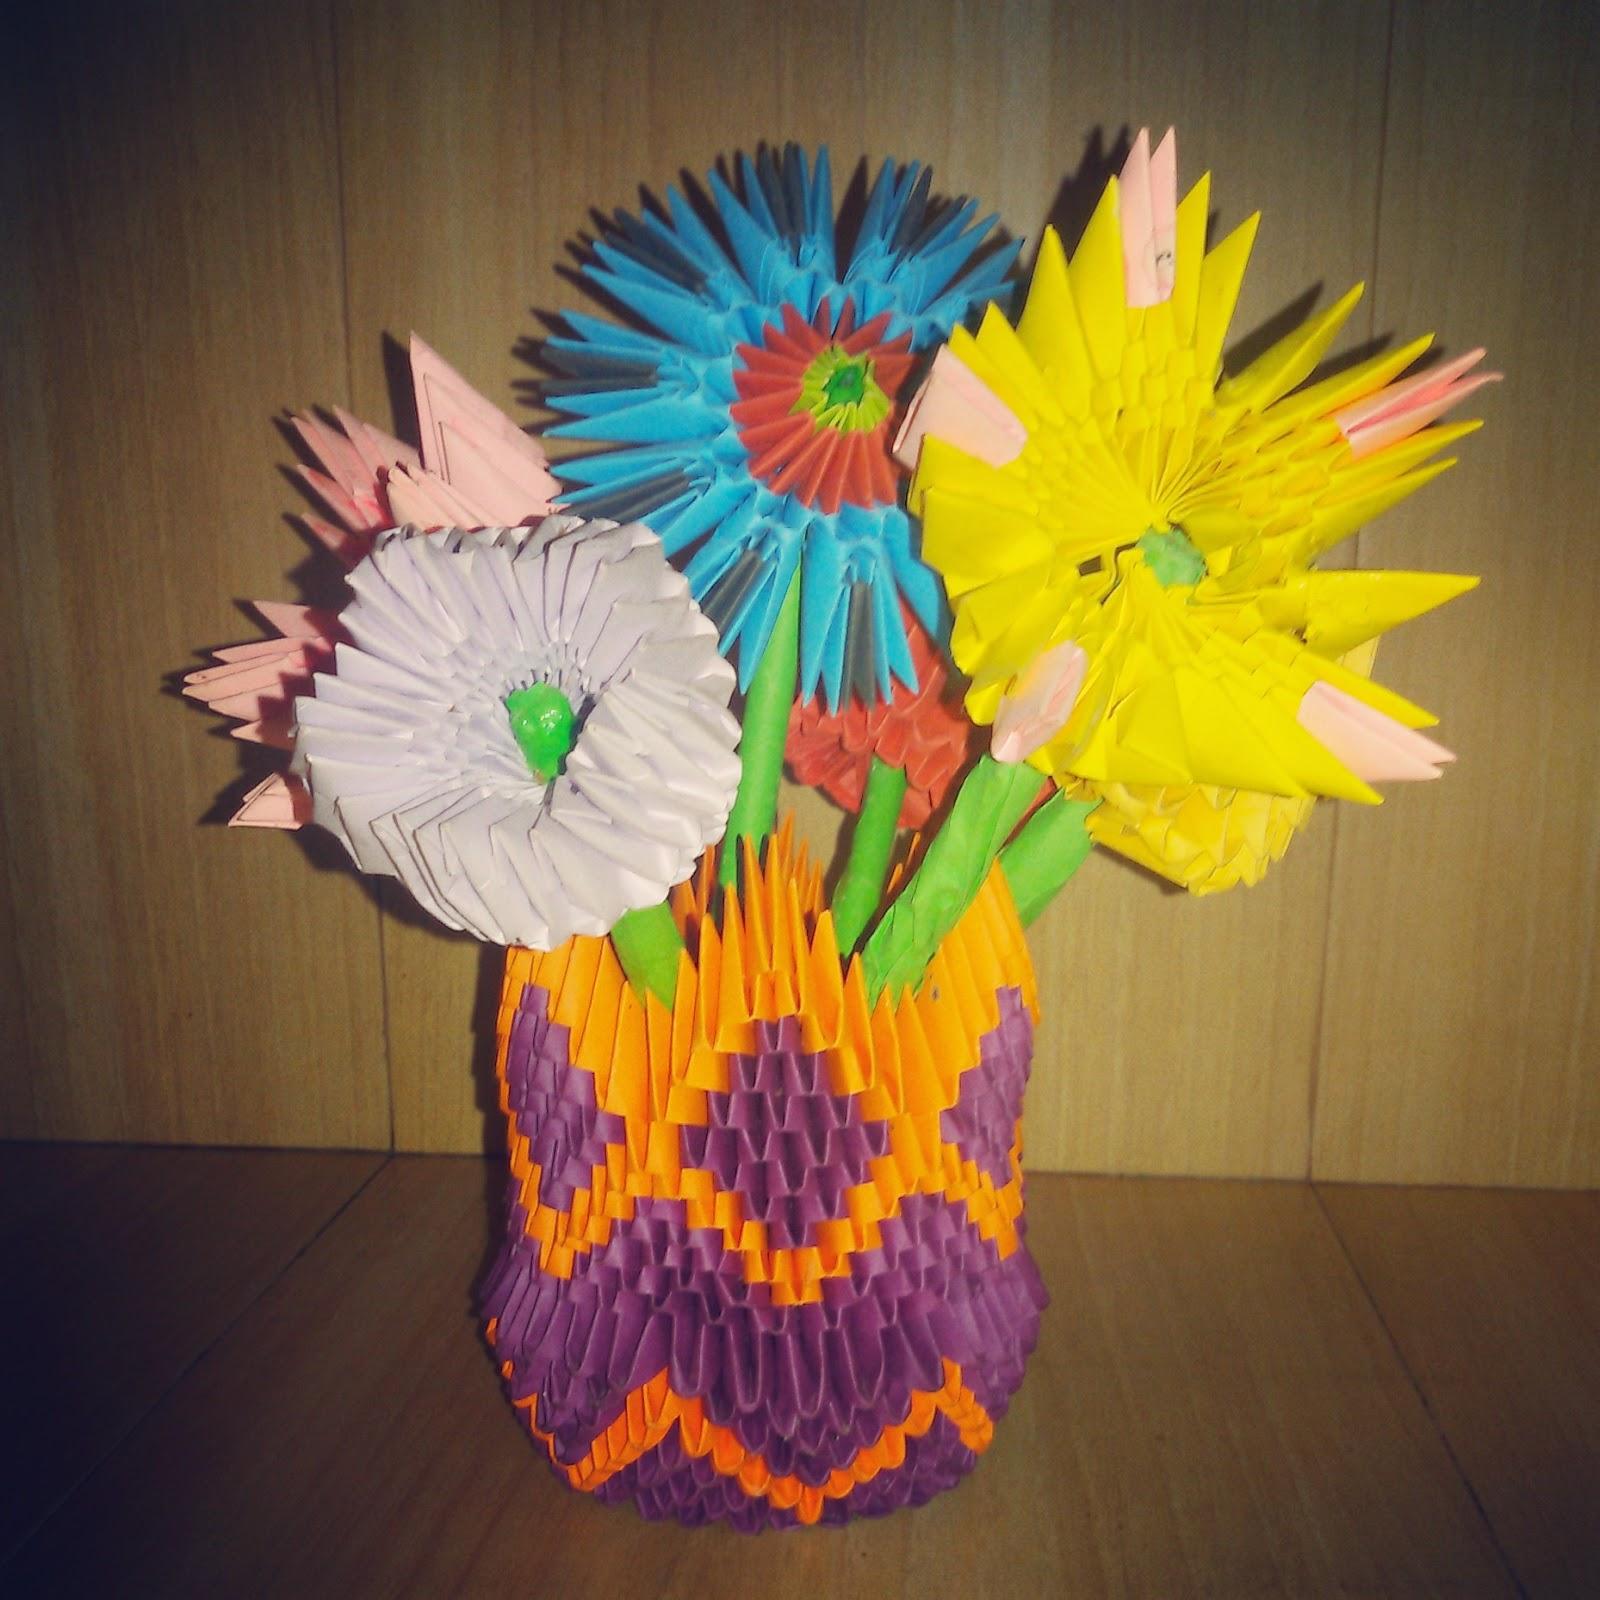 Madushis crafts 3d origami flower vase 3d origami flower vase mightylinksfo